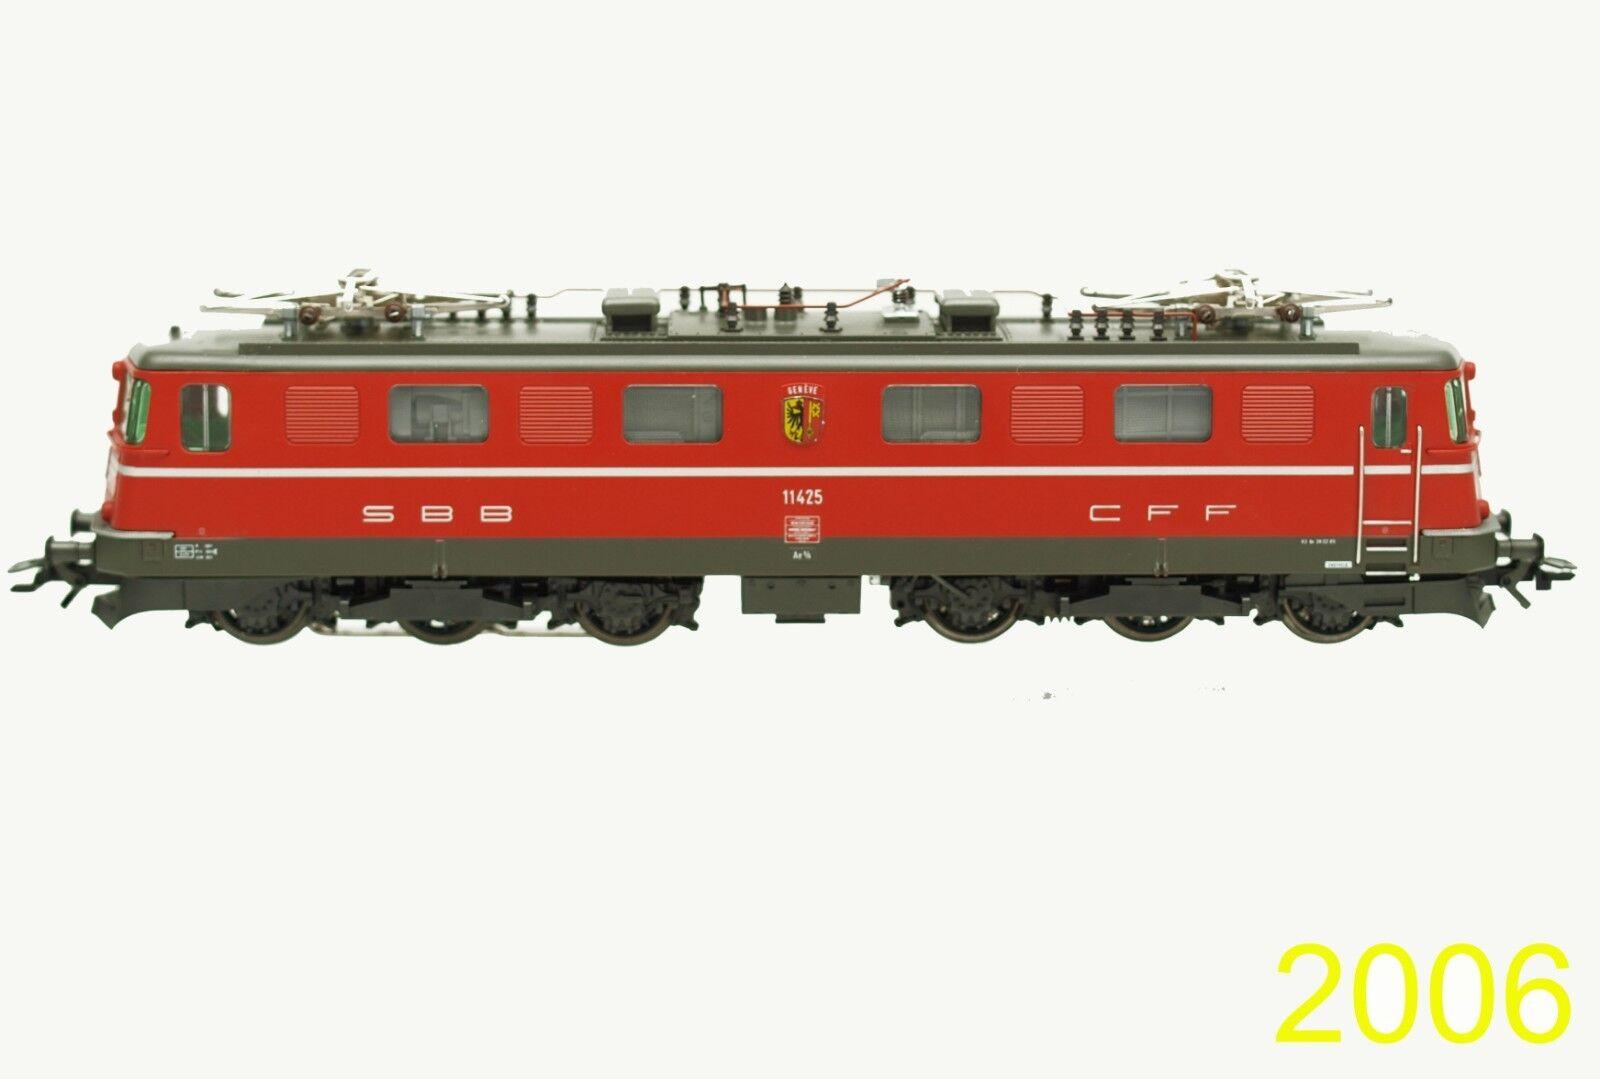 3636 AE 6/6 SSB CFF 11425 E-Lok Electric Locomotive OVP Digital